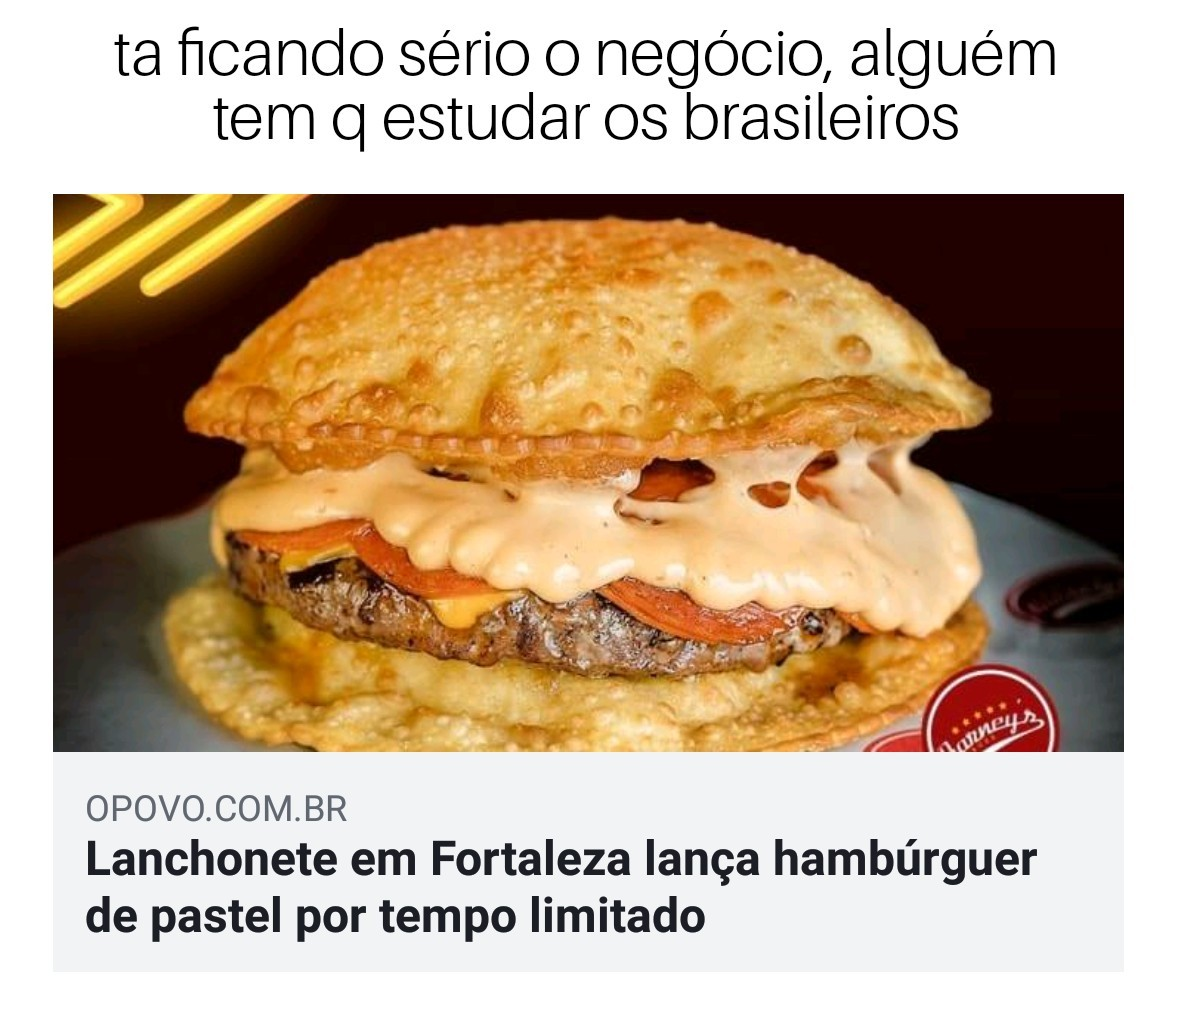 Hambúrguer de pastel, ai sim meu patrao - meme